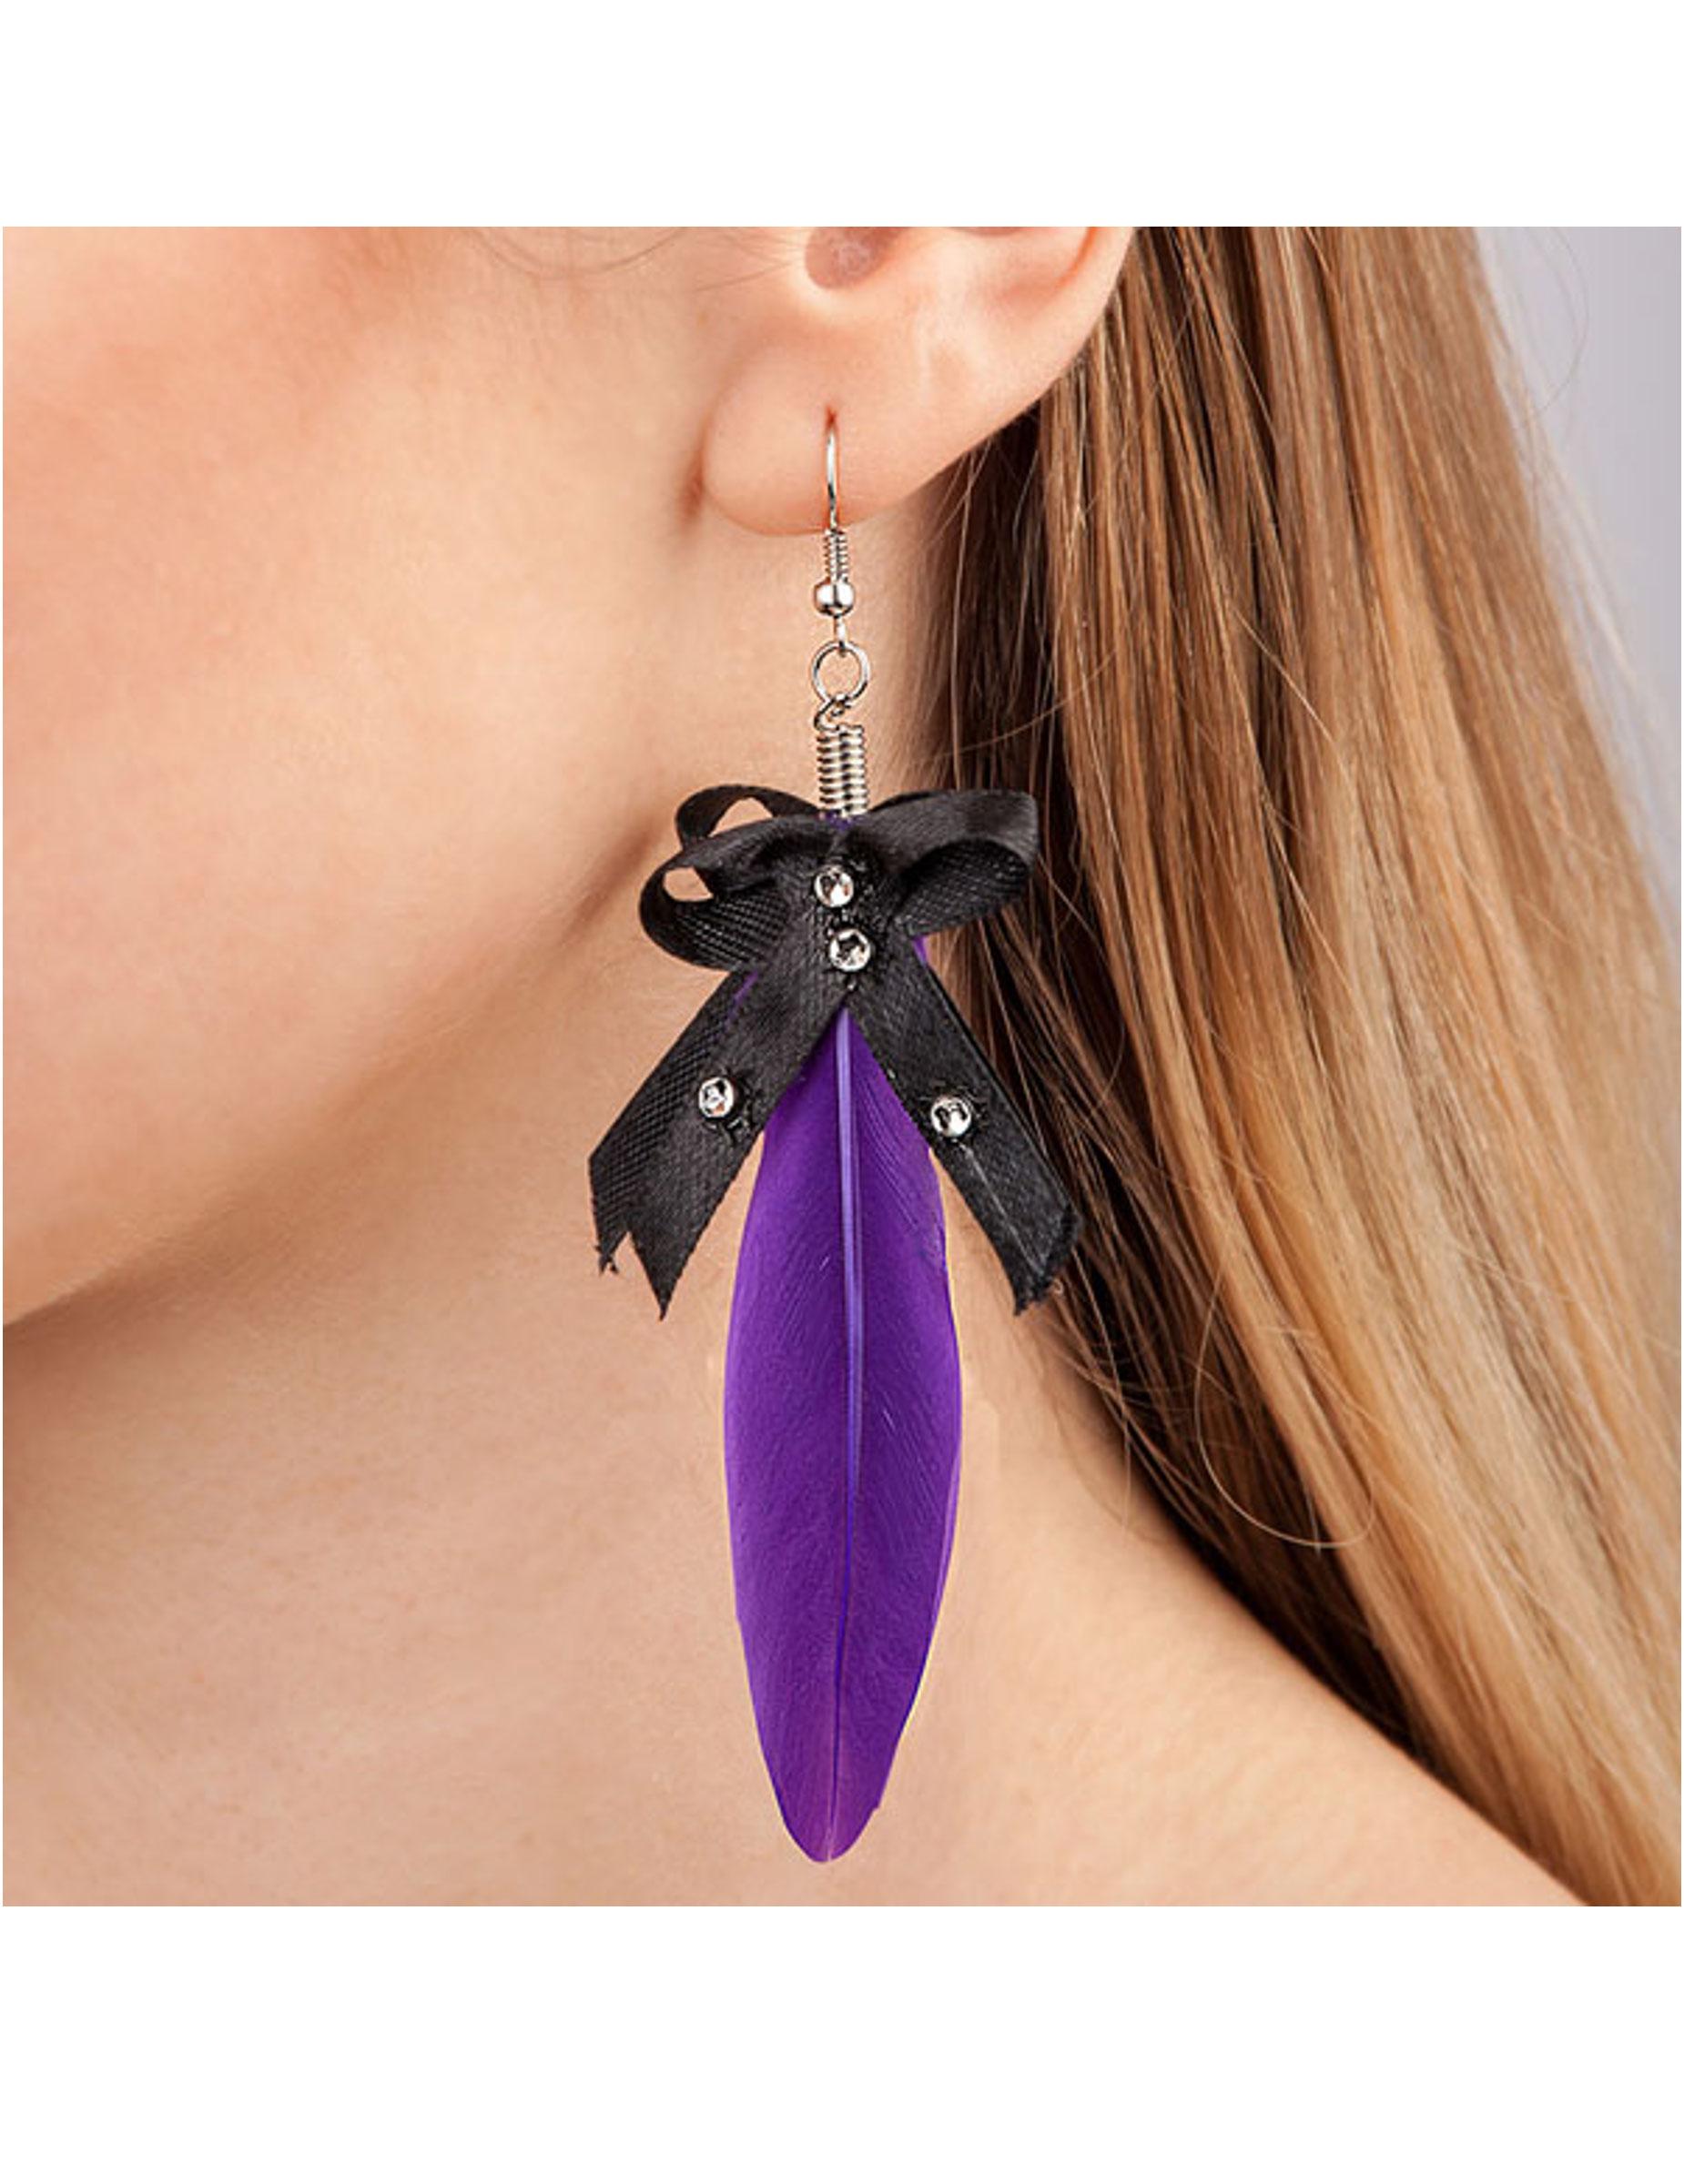 3099eb1d0ec5 Aretes pluma violeta adulto  Accesorios